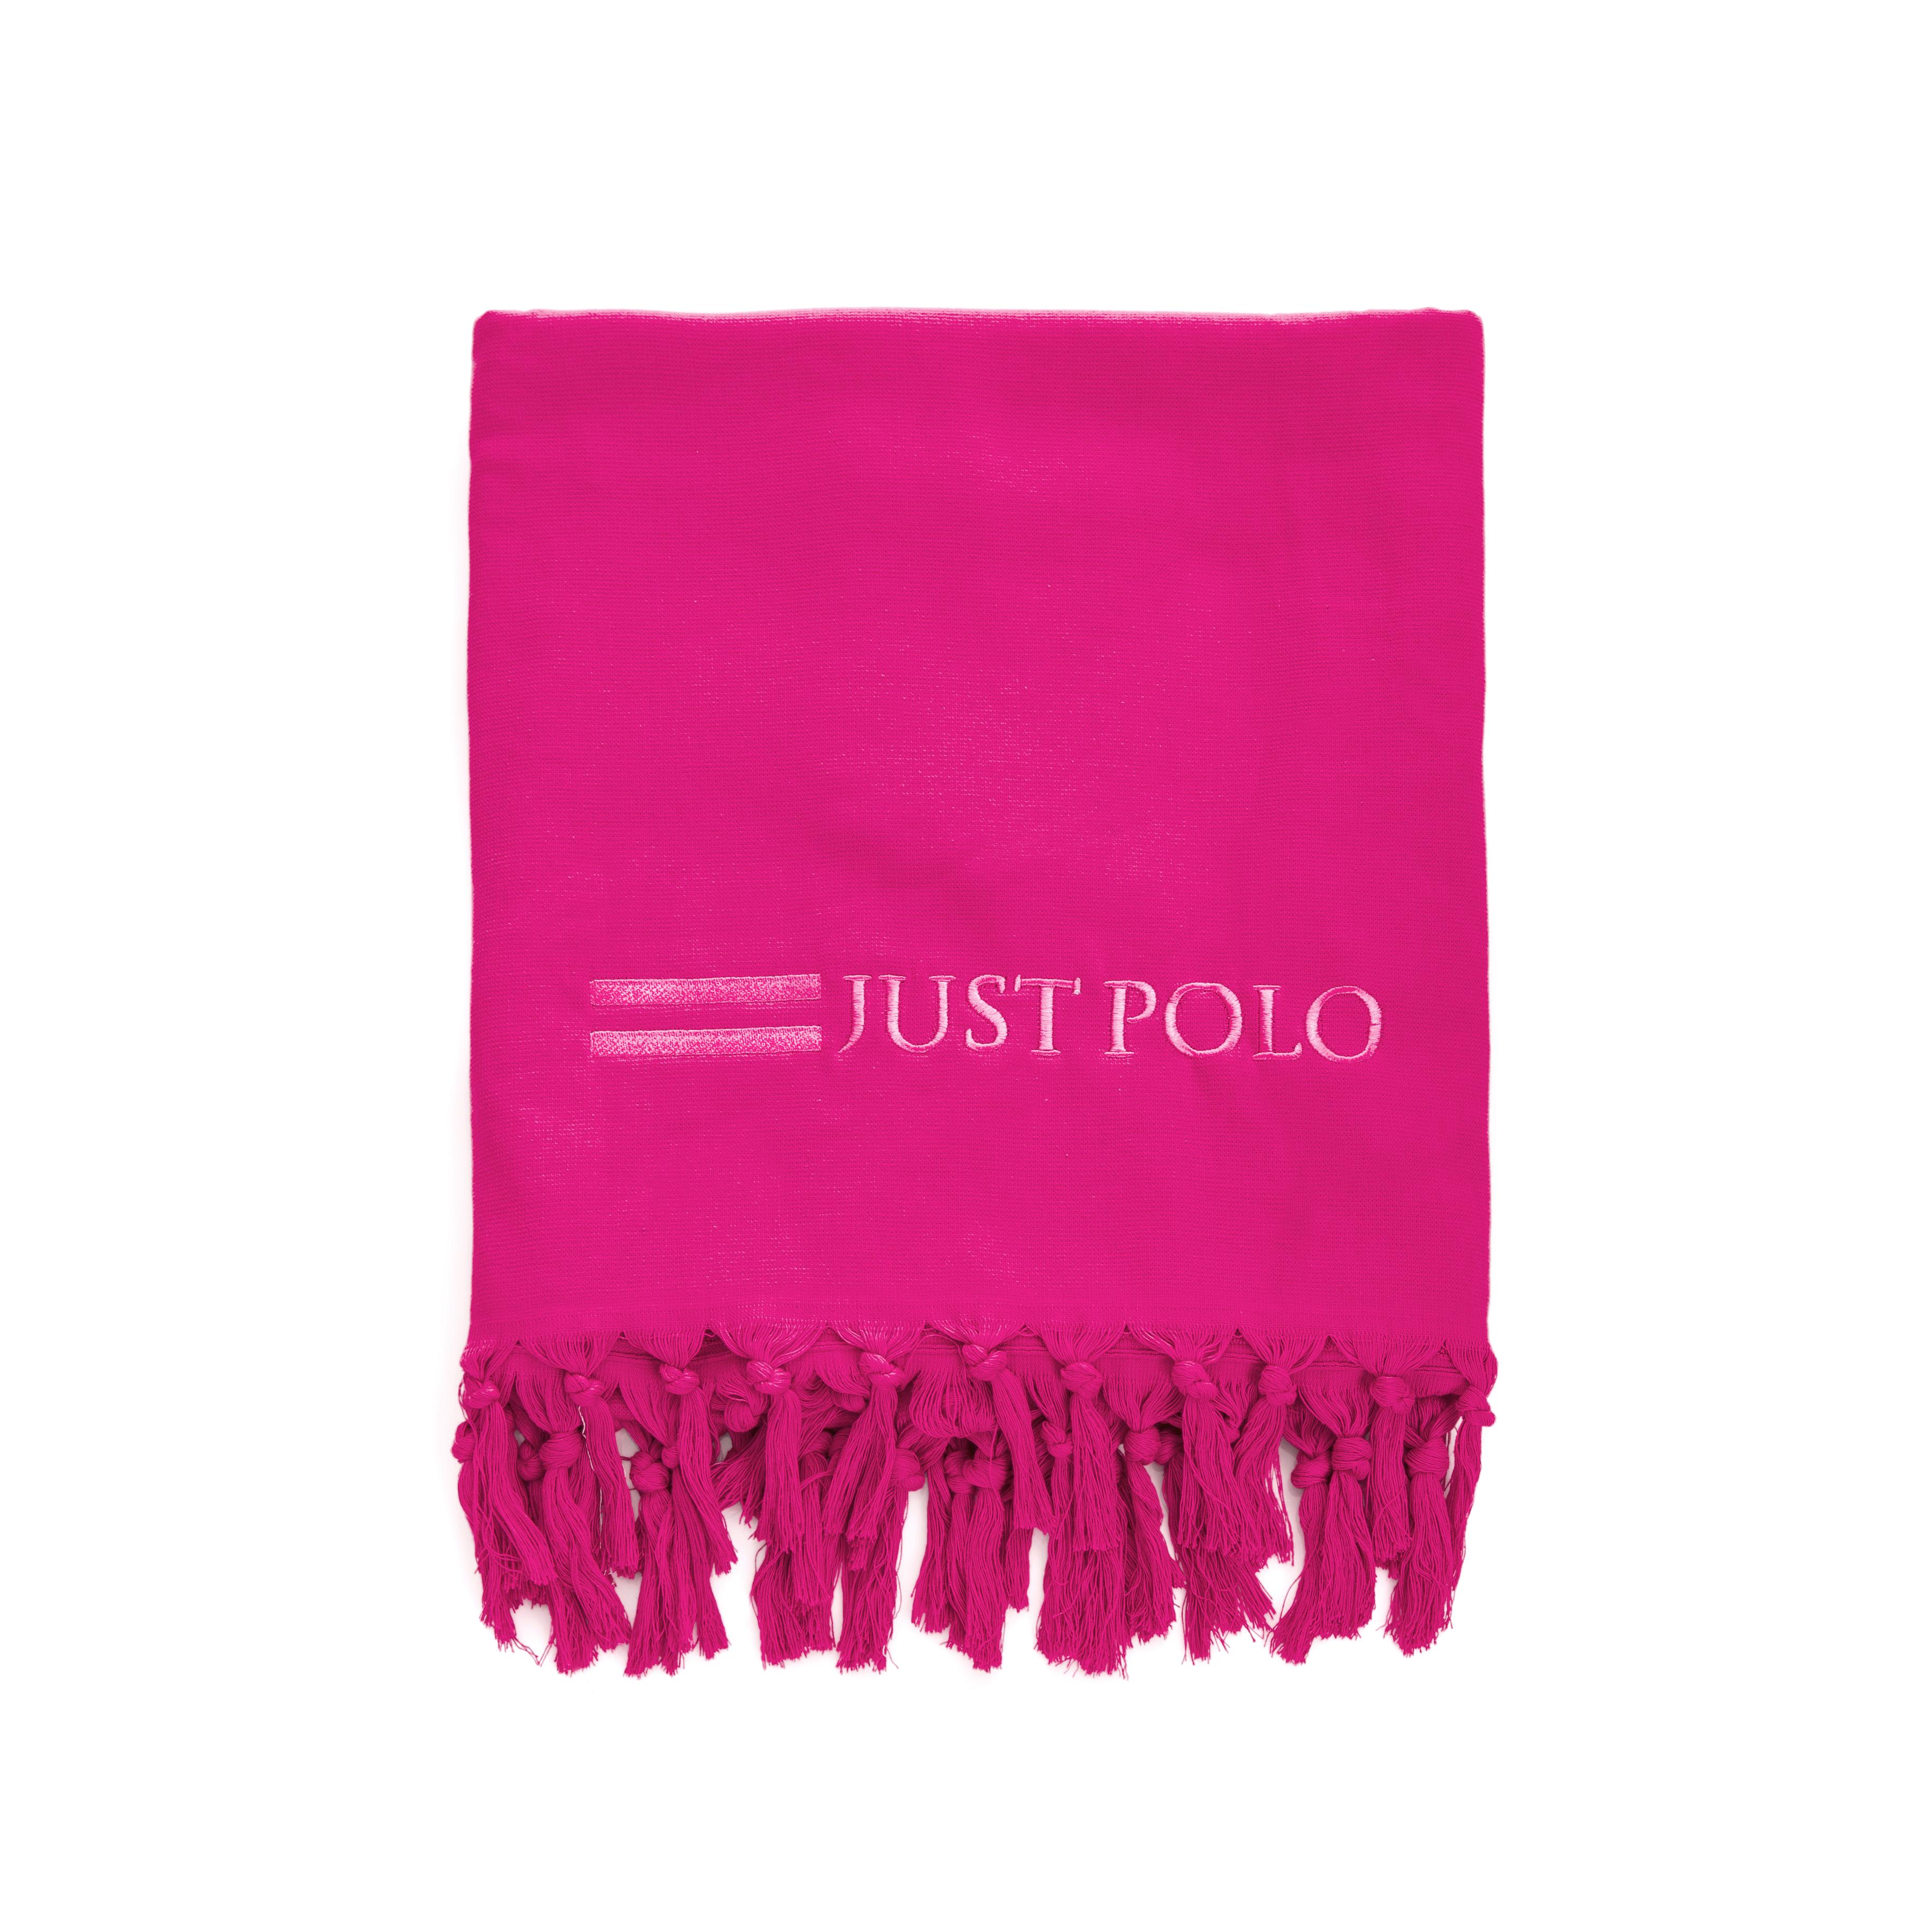 JUST POLO – Πετσέτα θαλάσσης Just Polo φούξια